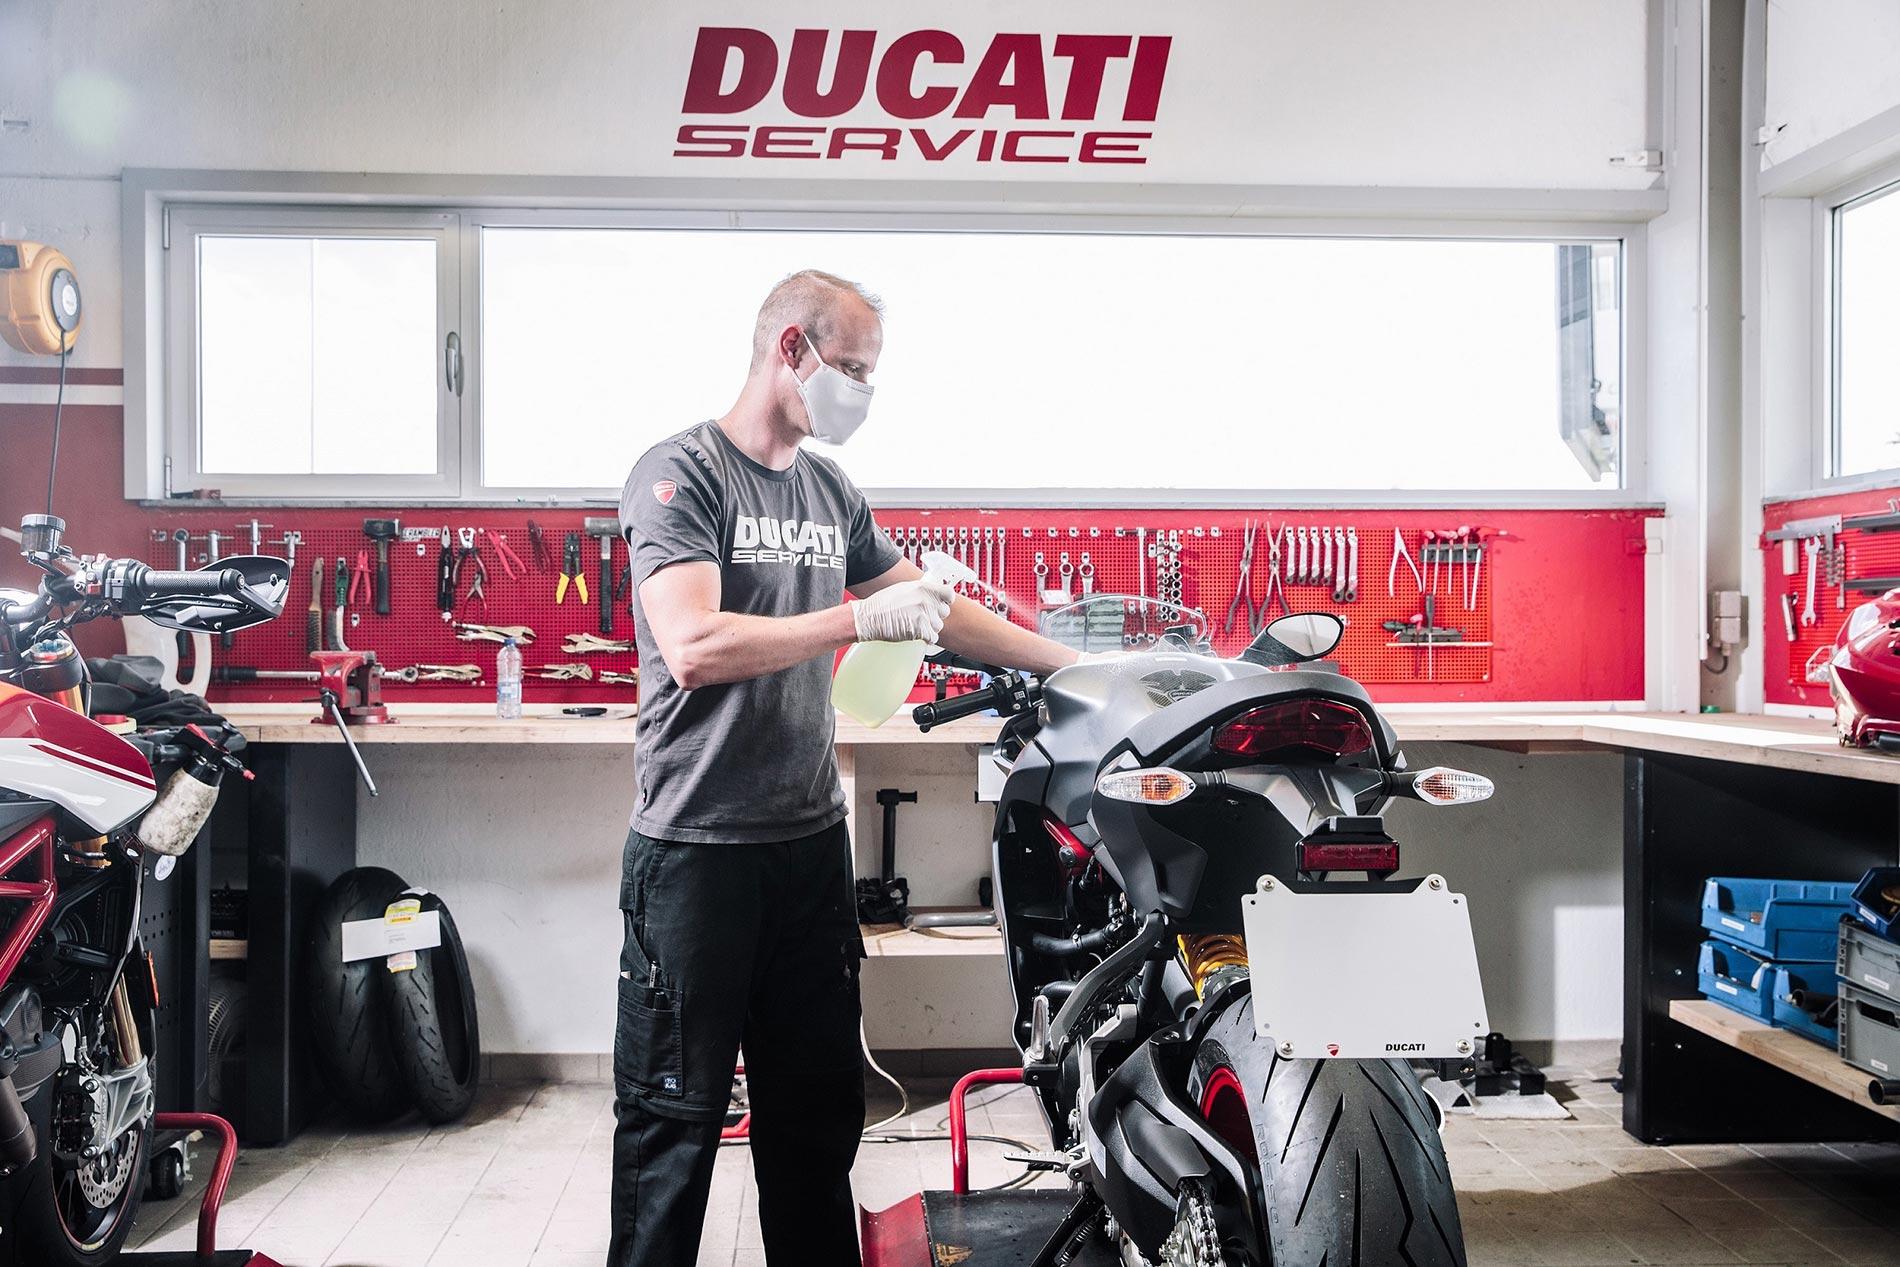 Ducati Cares - Καθαρισμός μοτοσυκλέτας Ducati στο service - Μέτρα προστασίας COVID19